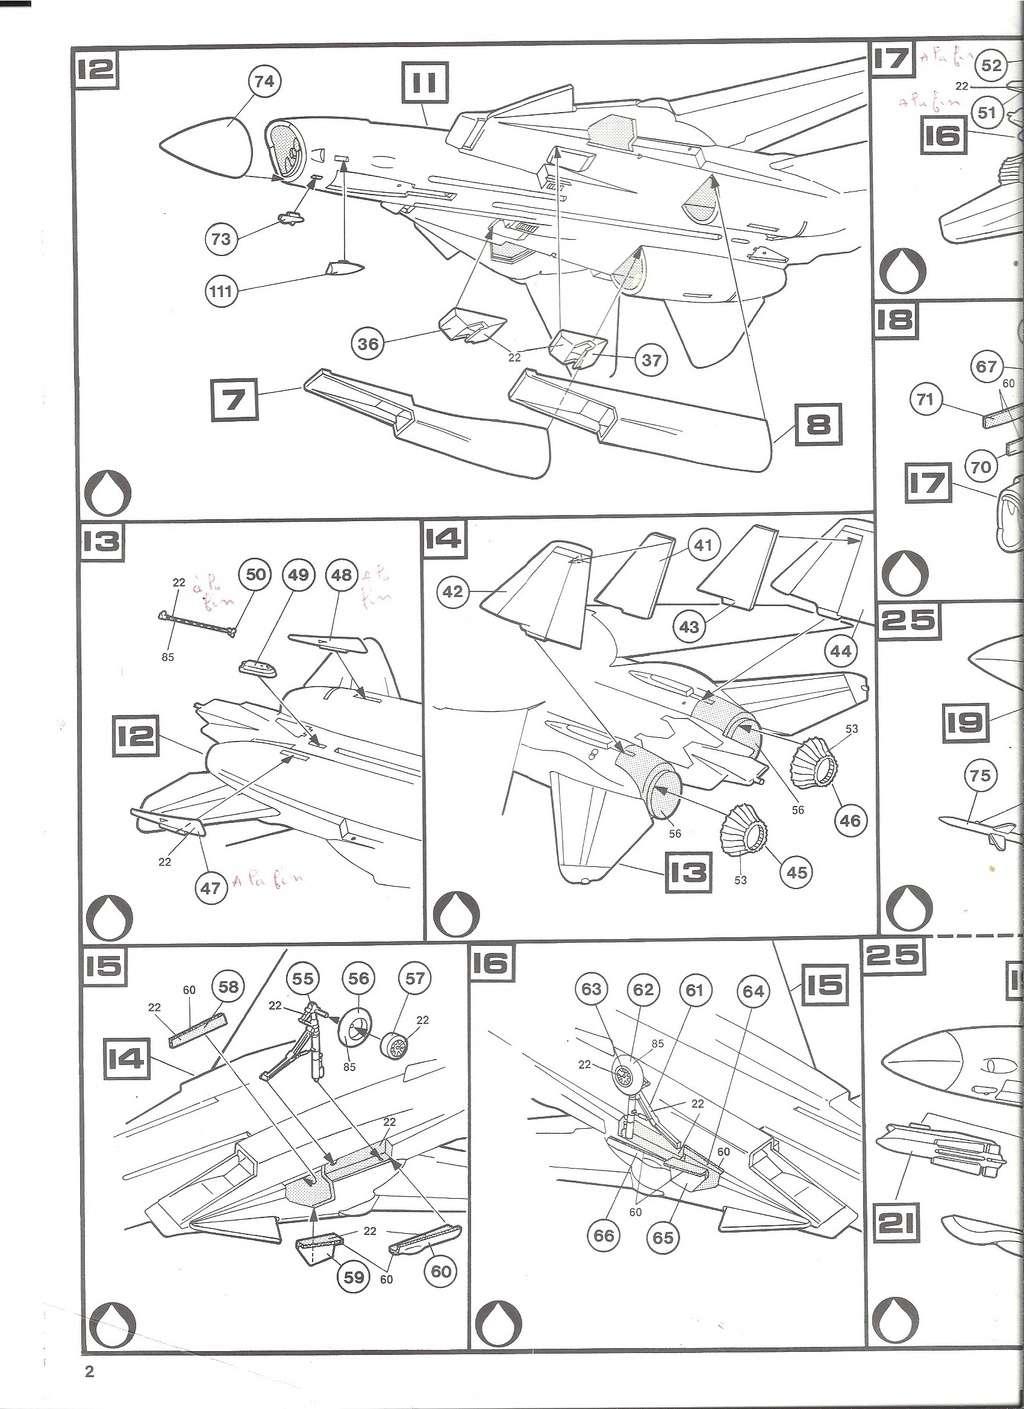 GRUMMAN F 14 A 1/72ème Réf 80335 Notice Helle186